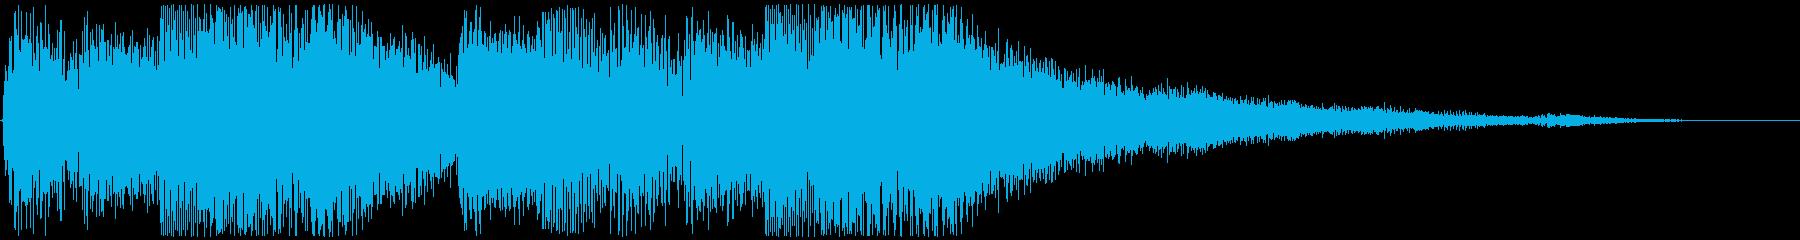 Flowing piano sound logo's reproduced waveform